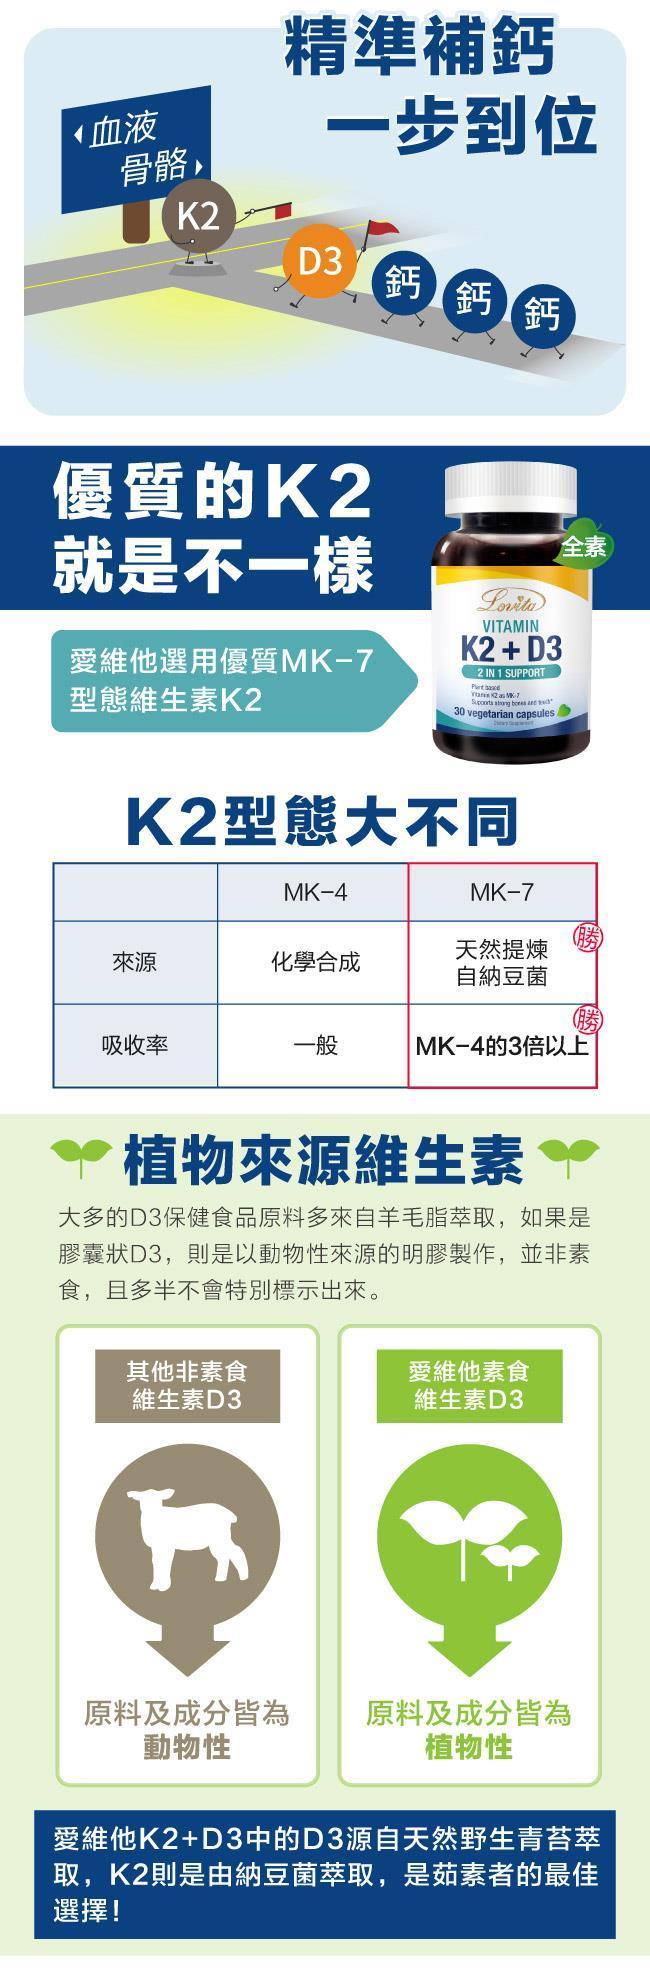 e10908012C愛維他維生素K2+D3素食膠囊